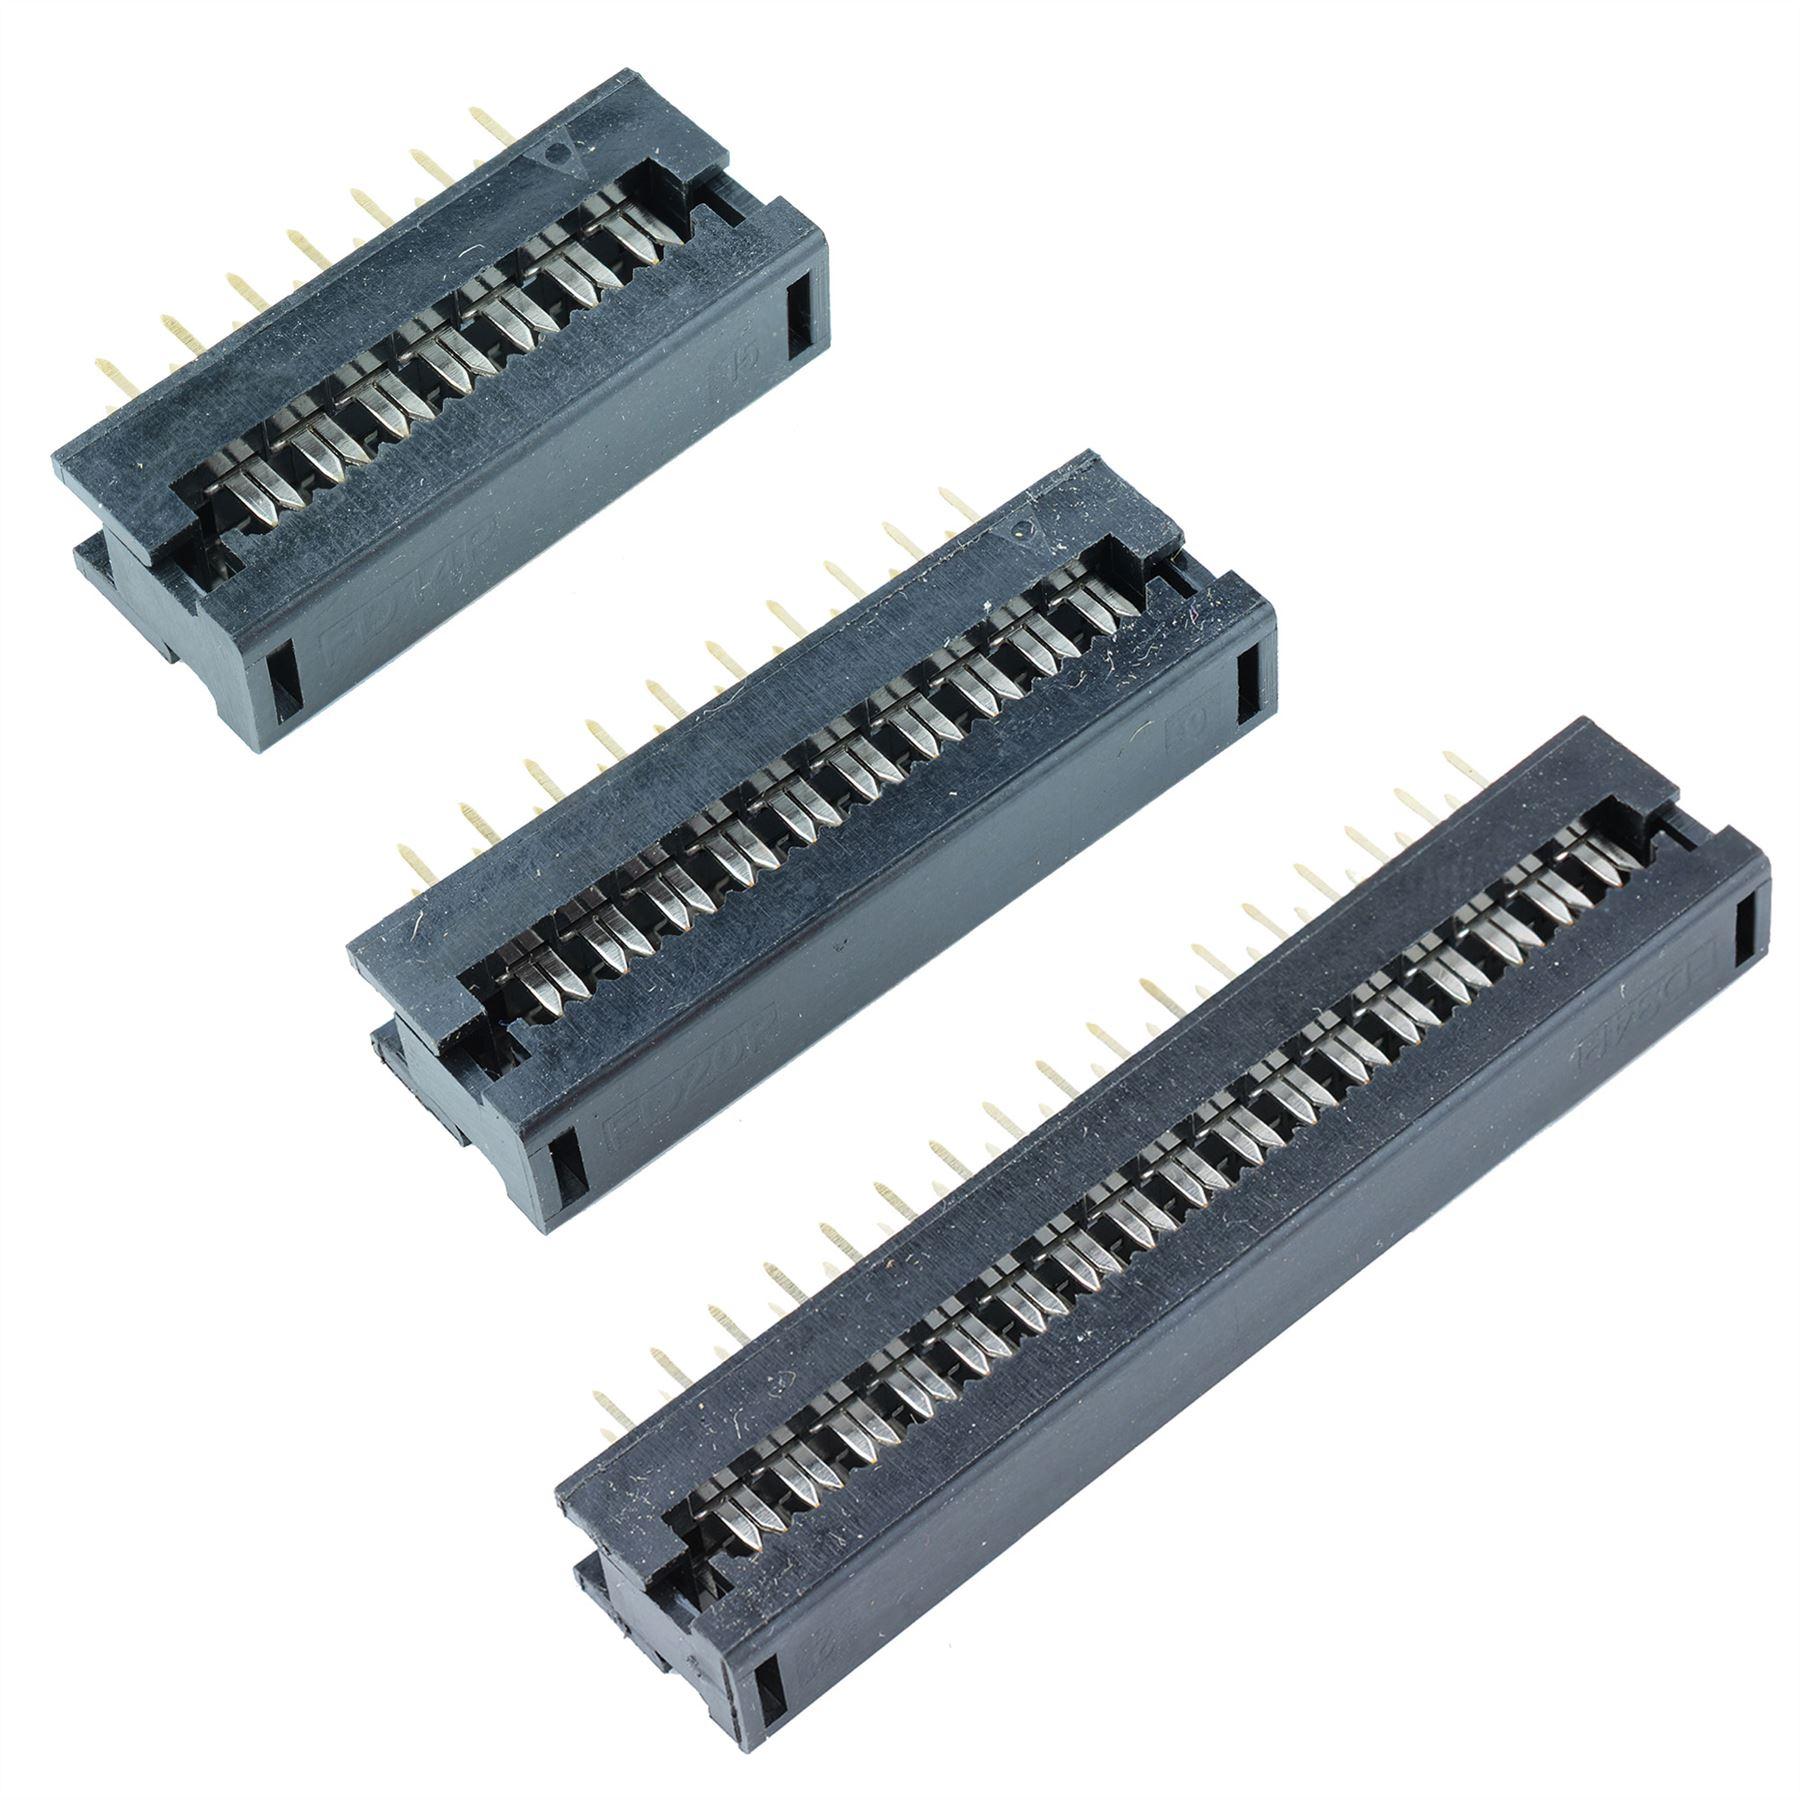 Flat Ribbon Cable Idc Socket Plug Connector 2 54mm Pitch Ebay